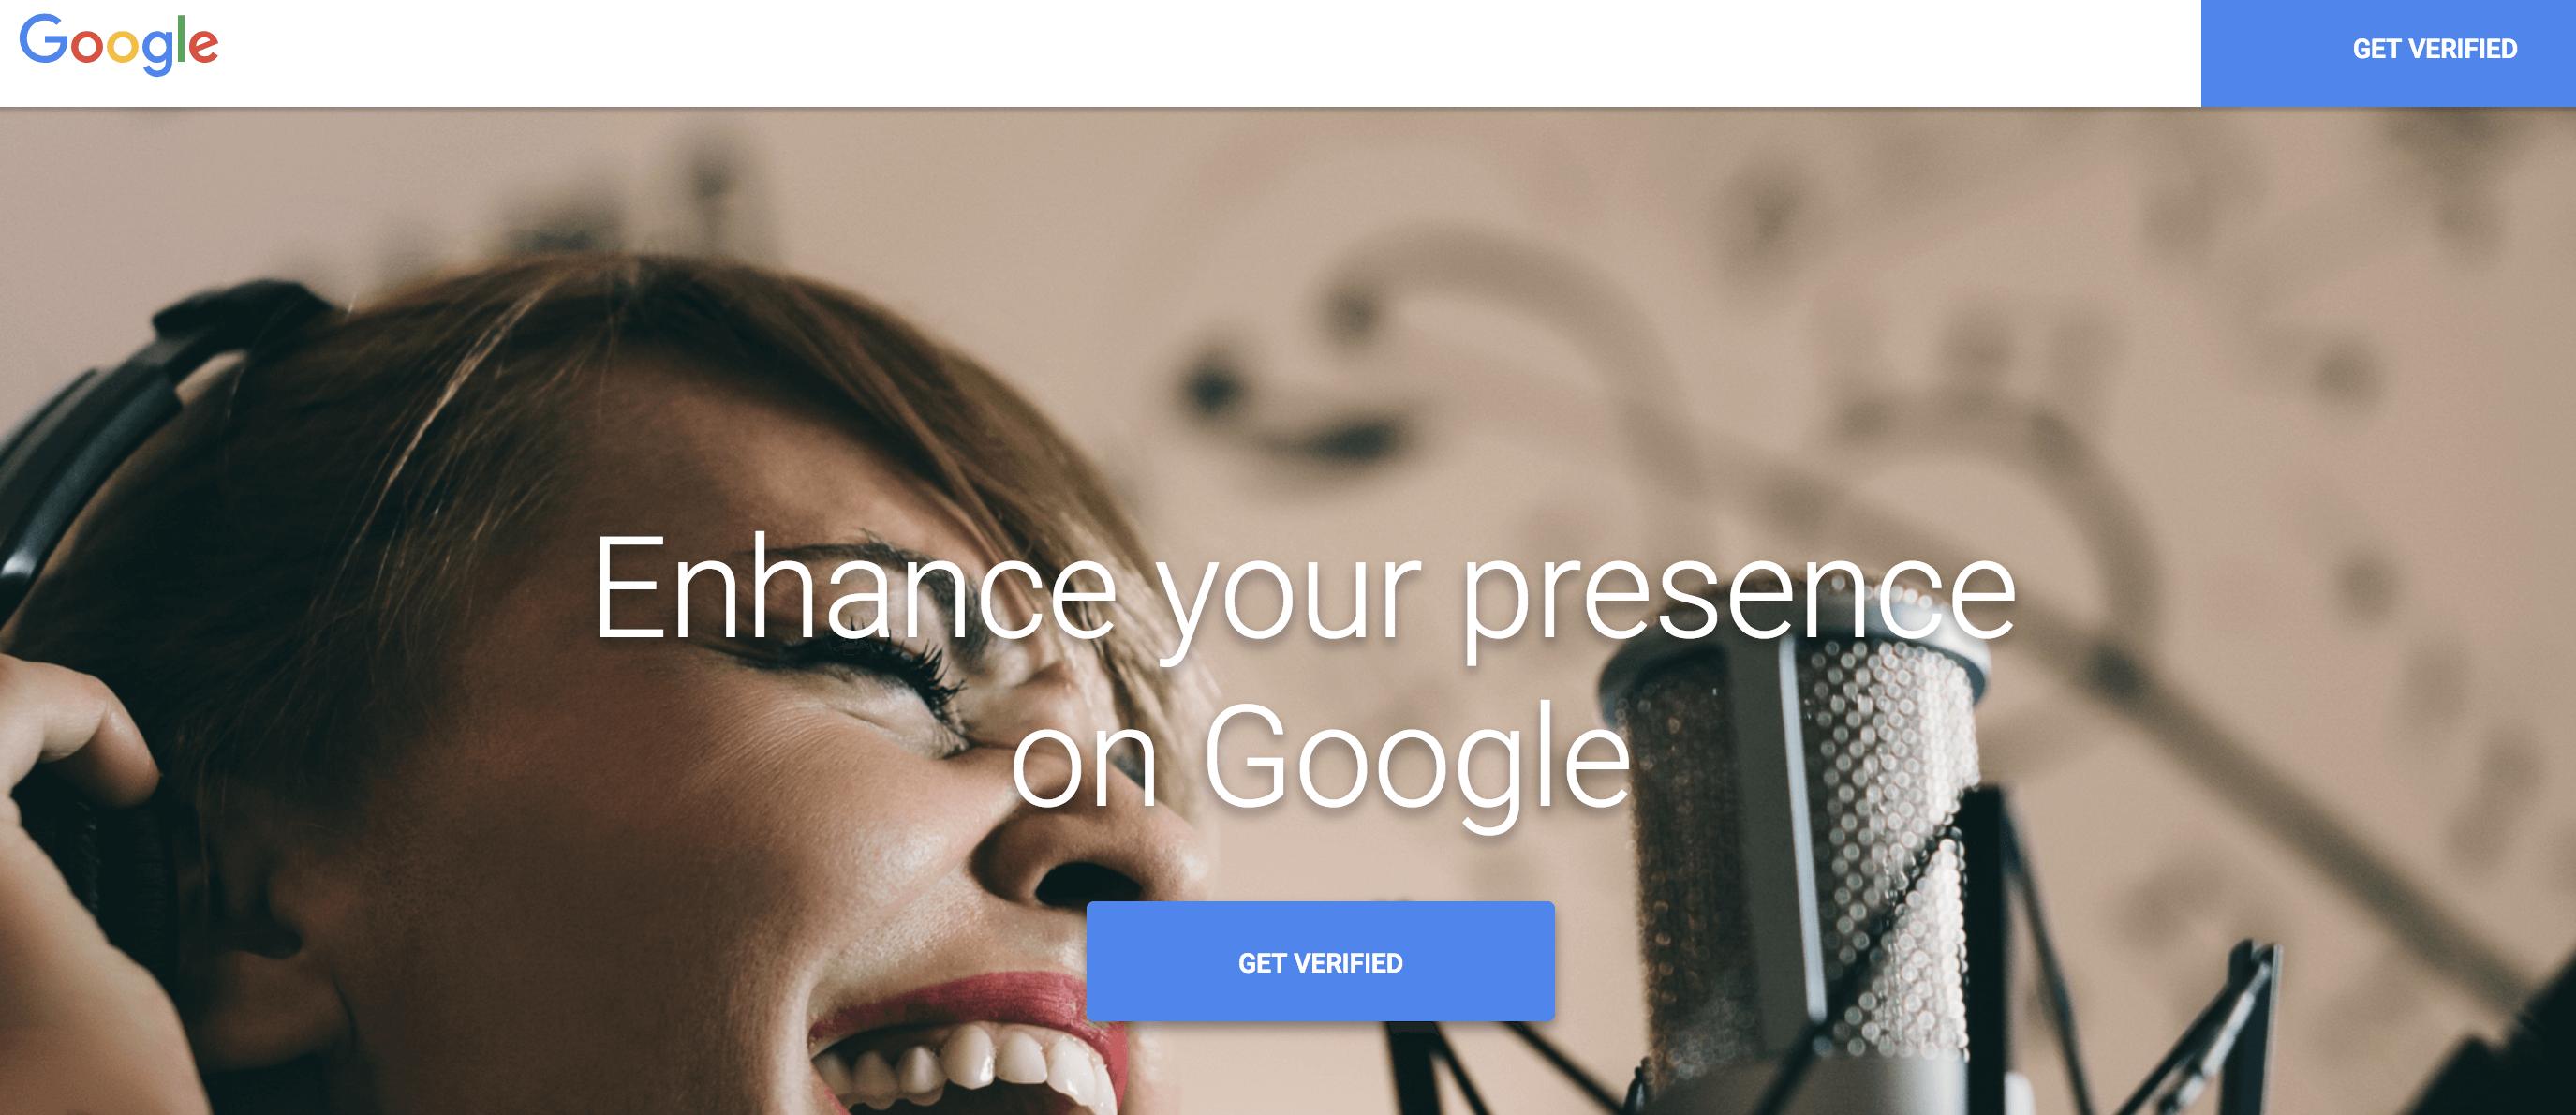 knowledge panel Get Verified Website Google